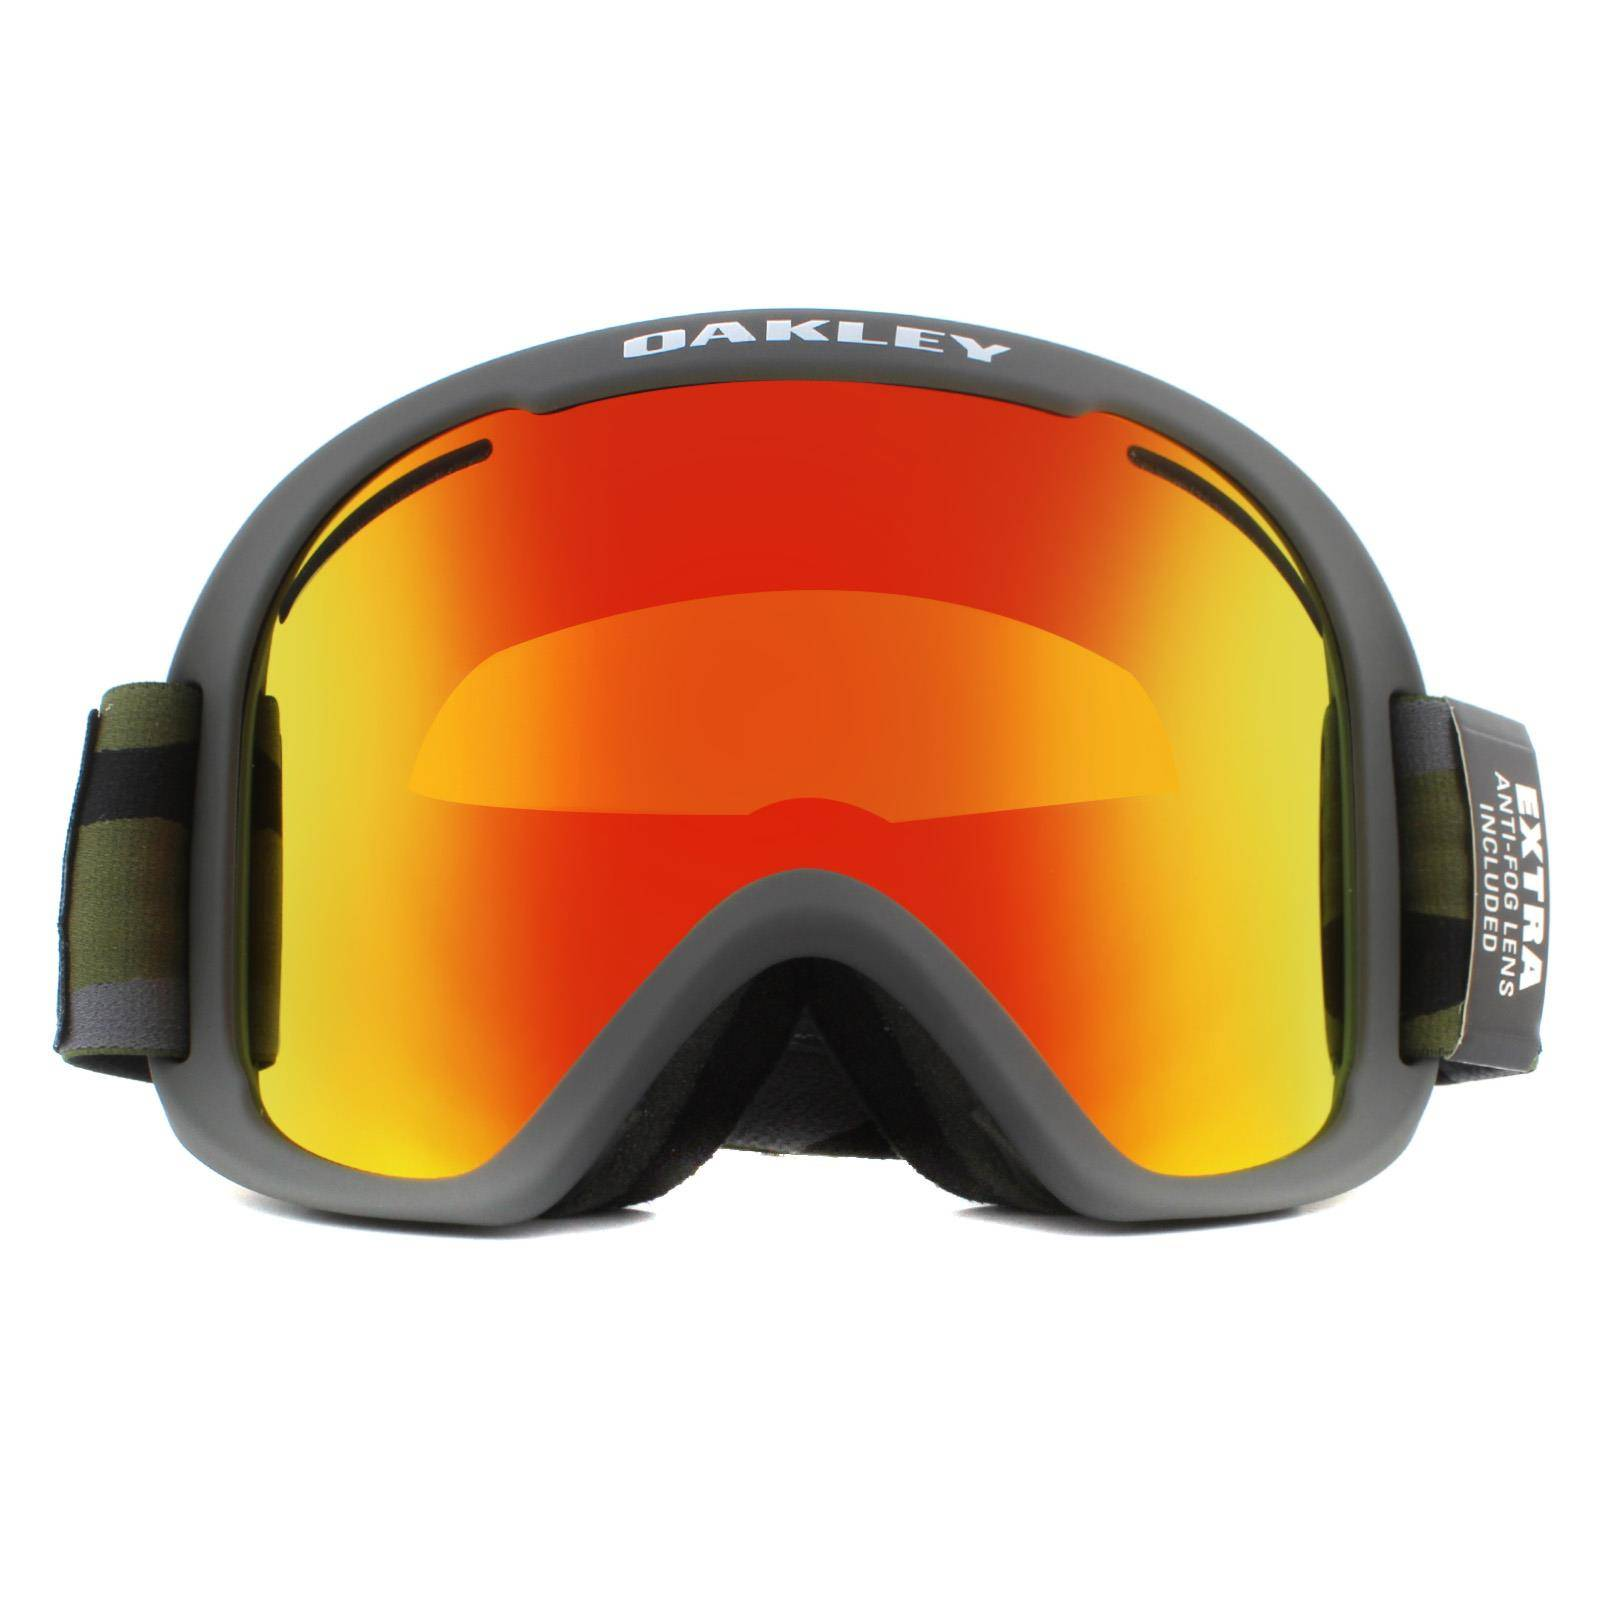 Oakley Ski Goggles O-Frame 2.0 PRO XL OO7112-14 Dark Brush Camo Fire Iridium & Persimmon